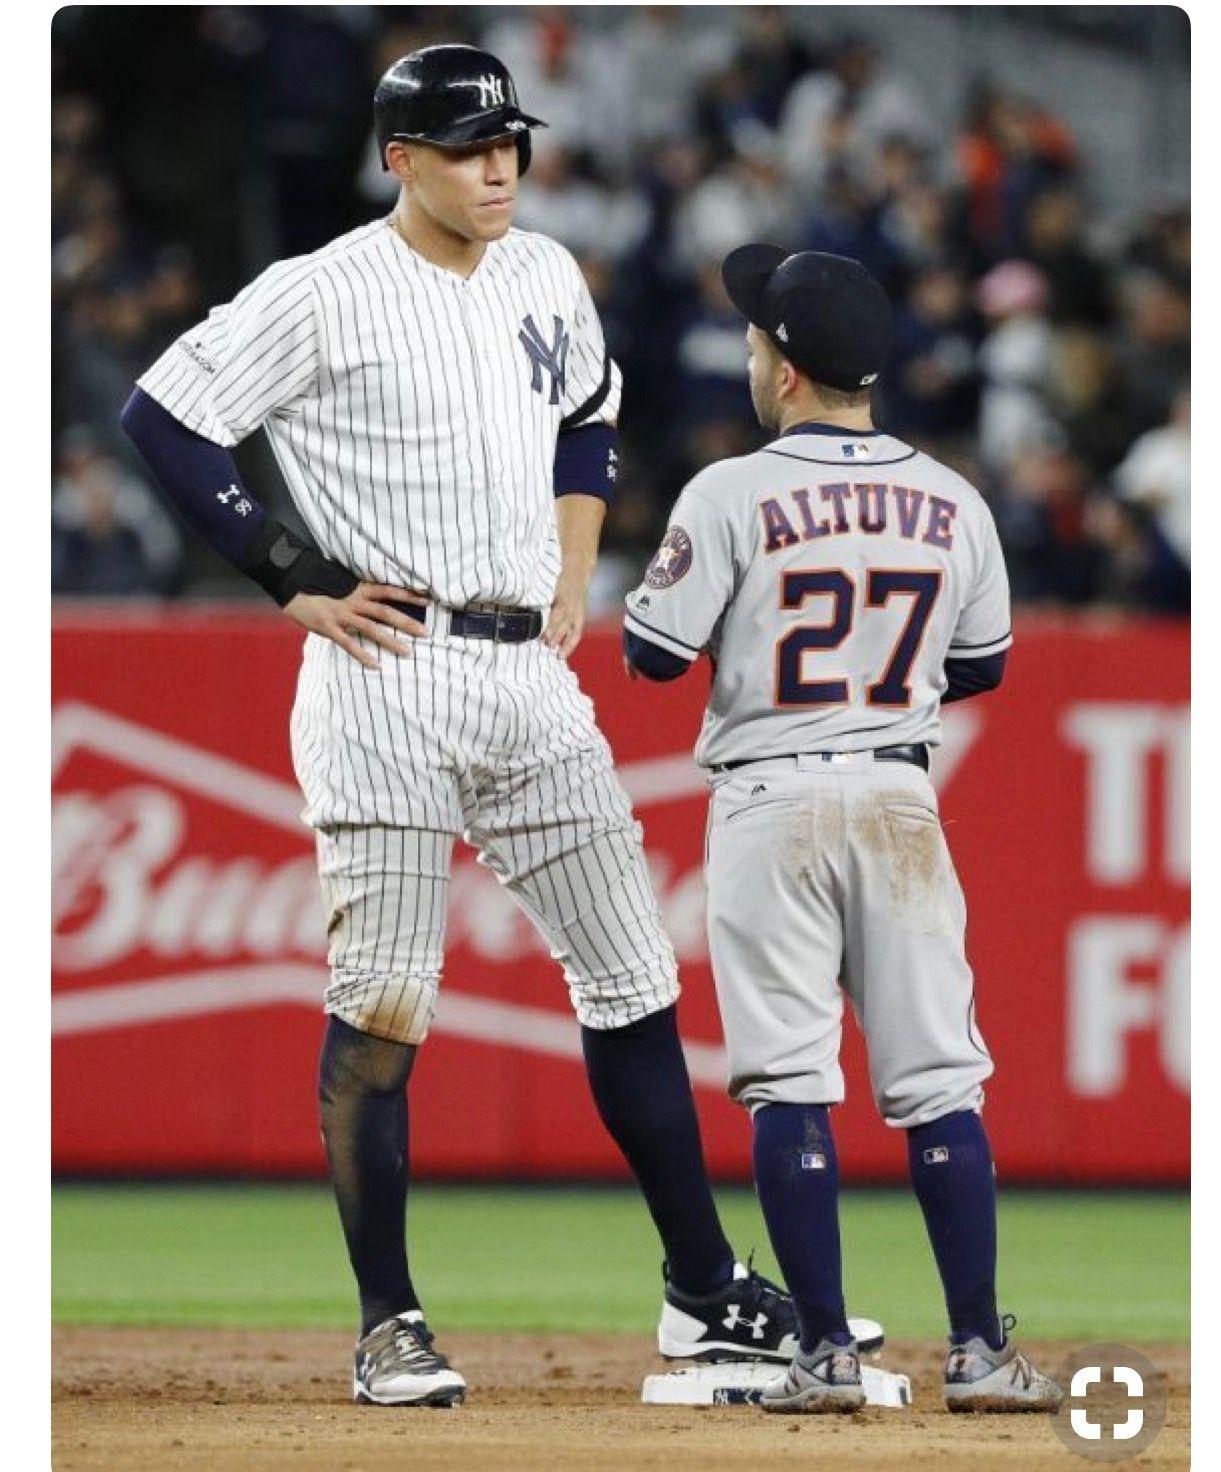 59ab42f35 Aaron Judge (Yankees) and Jose Altuve (Astros) ALCS (2017 ...